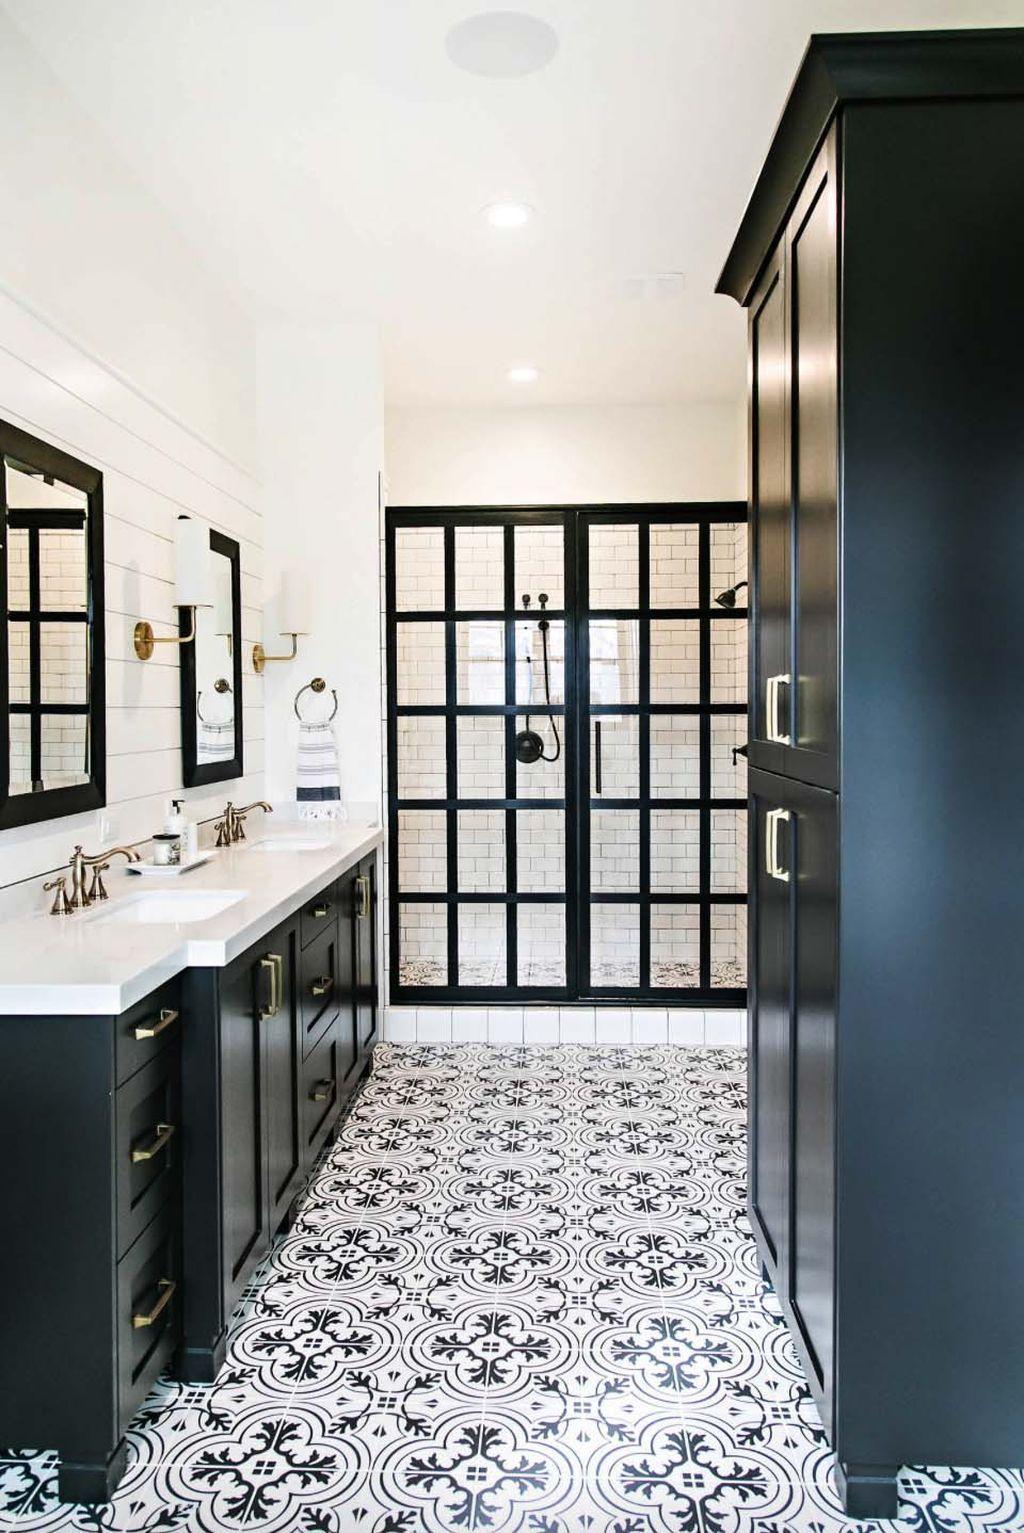 75 Modern Rustic Farmhouse Style Master Bathroom Ideas Homeastern Com Bathroom Remodel Master Bathroom Farmhouse Style Bathroom Interior Design